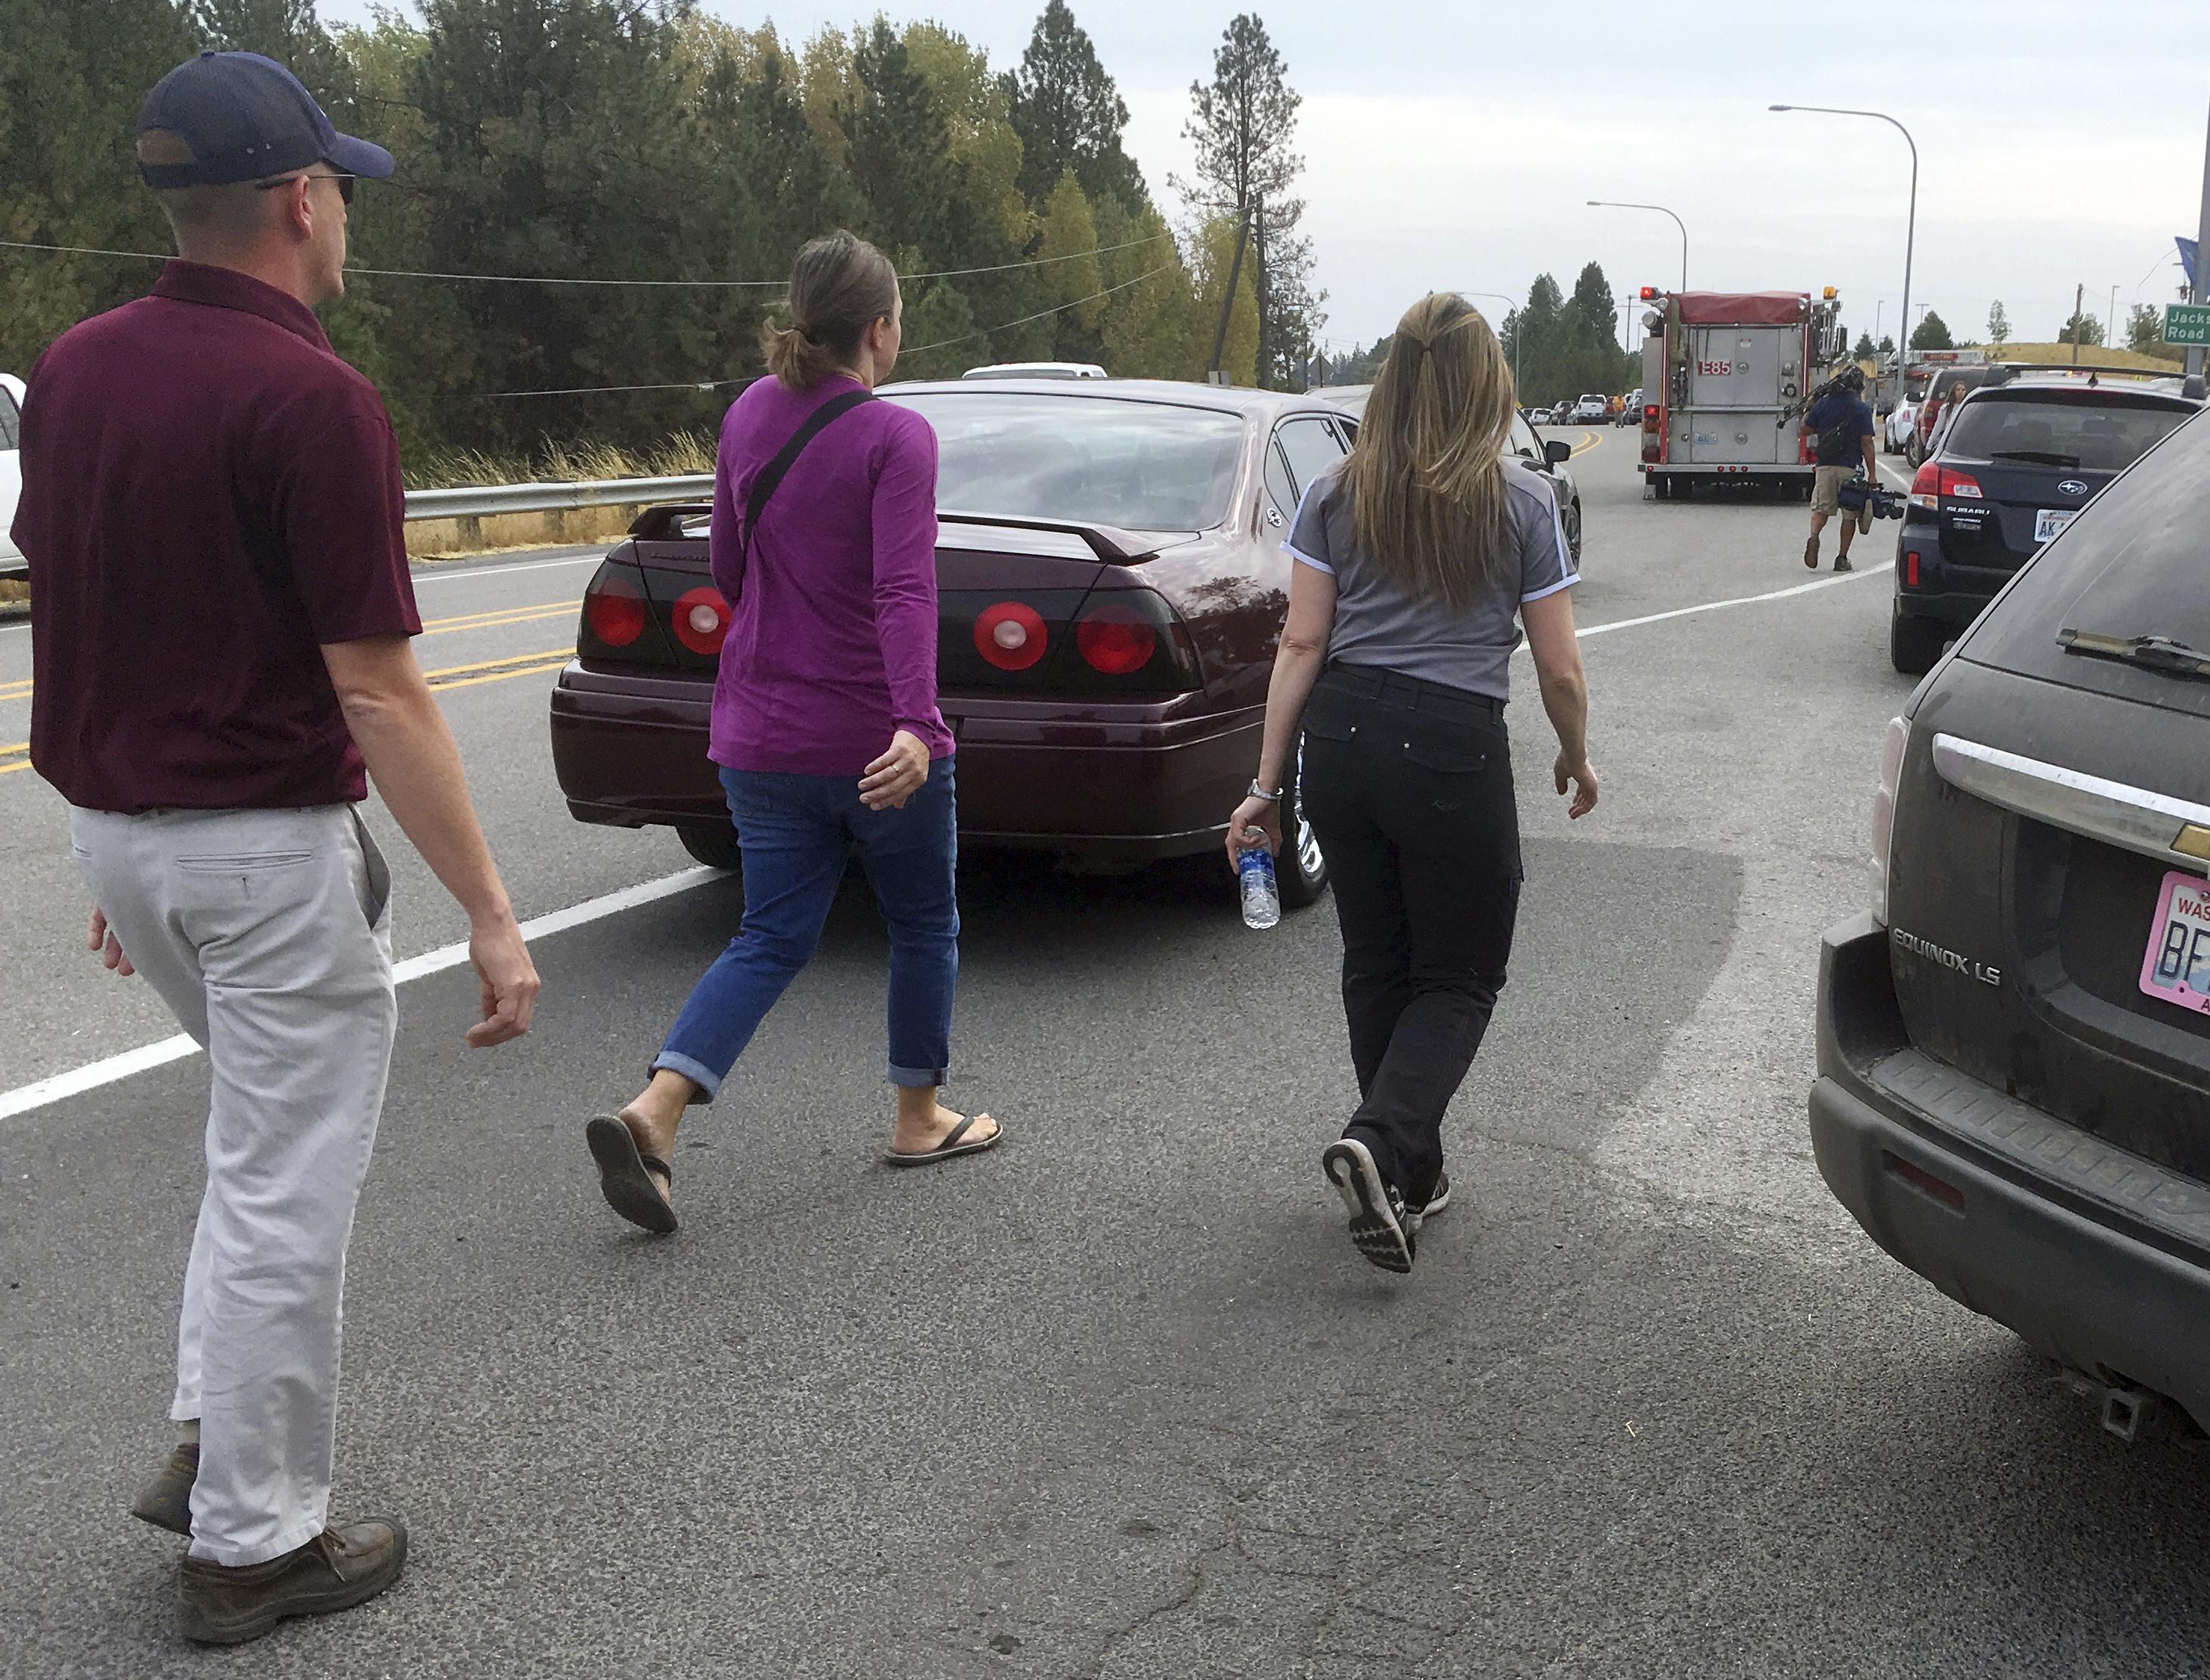 People hurry toward Freeman High School. (AP)